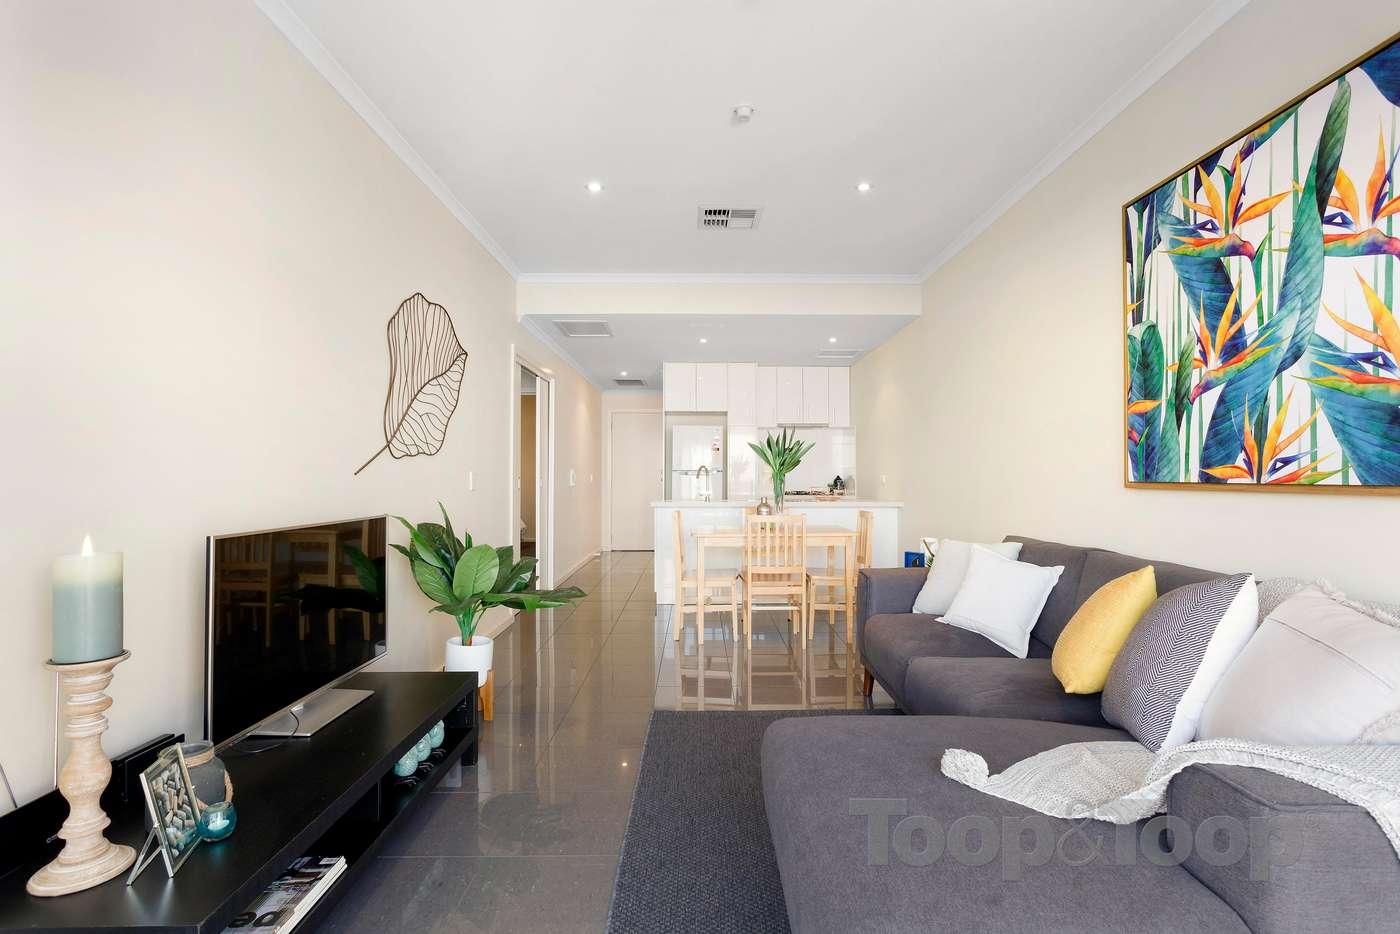 Sixth view of Homely apartment listing, 5/103 Elder Drive, Mawson Lakes SA 5095